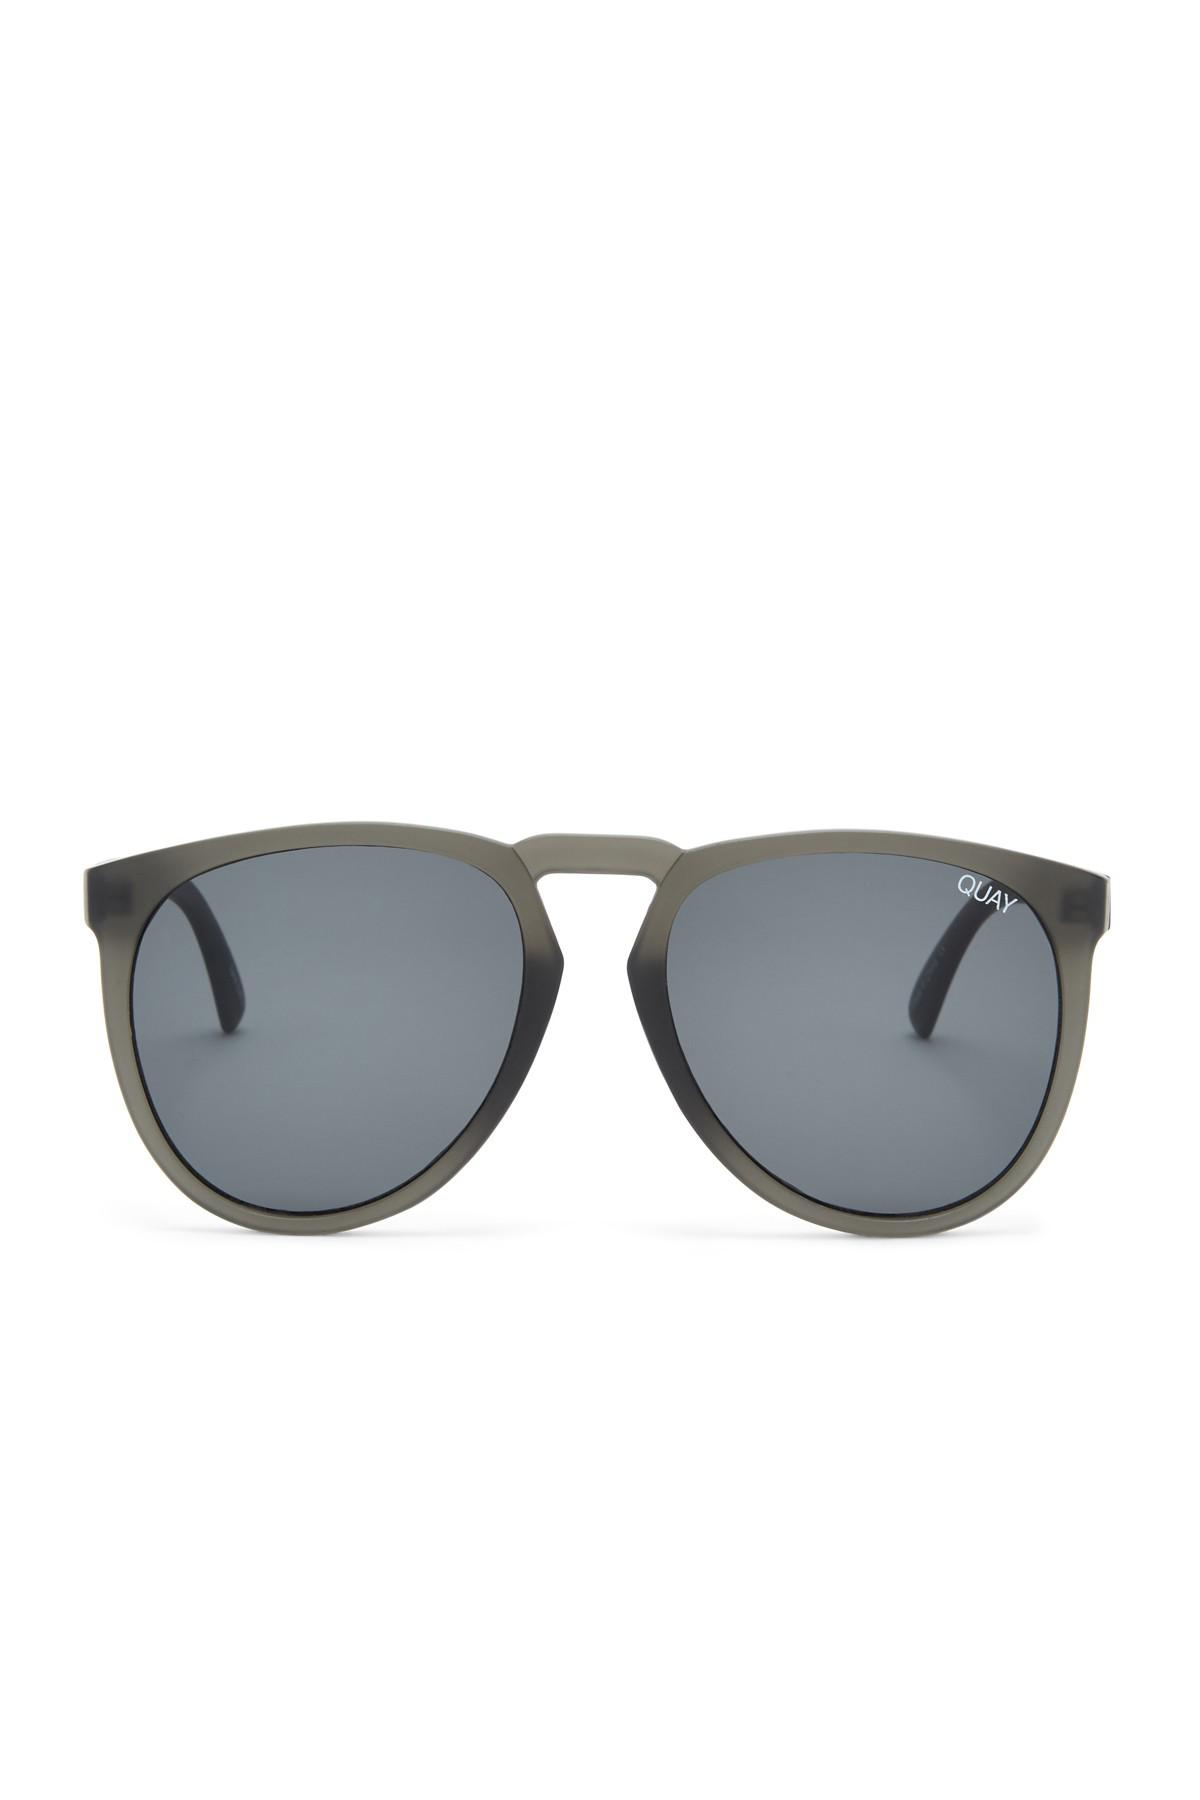 647b16975e Lyst - Quay Phd 58mm Aviator Sunglasses in Gray for Men